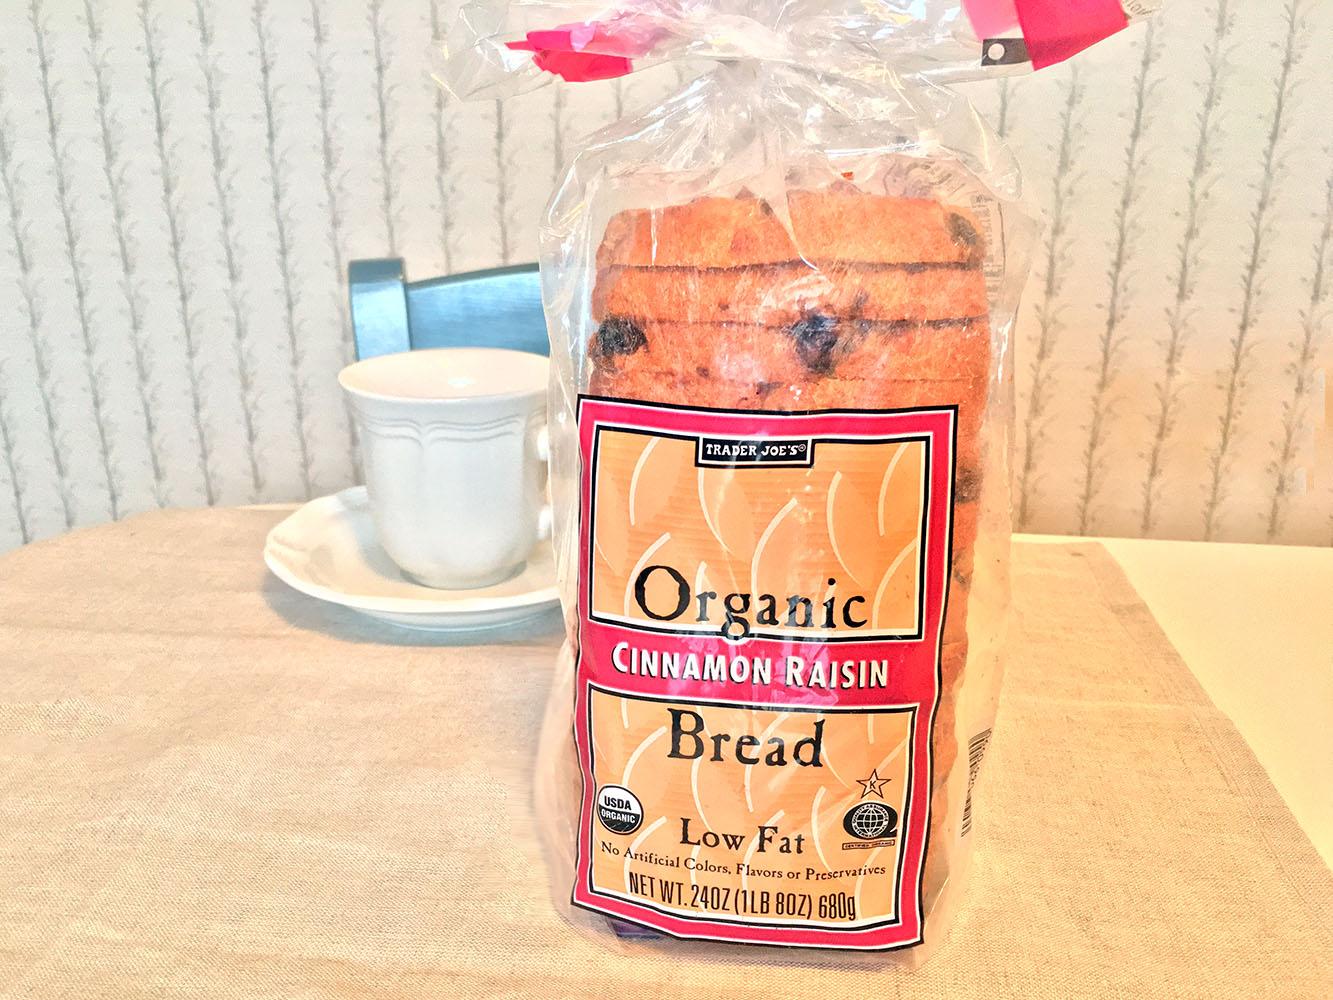 Trader Joes Organic Cinnamon Bread